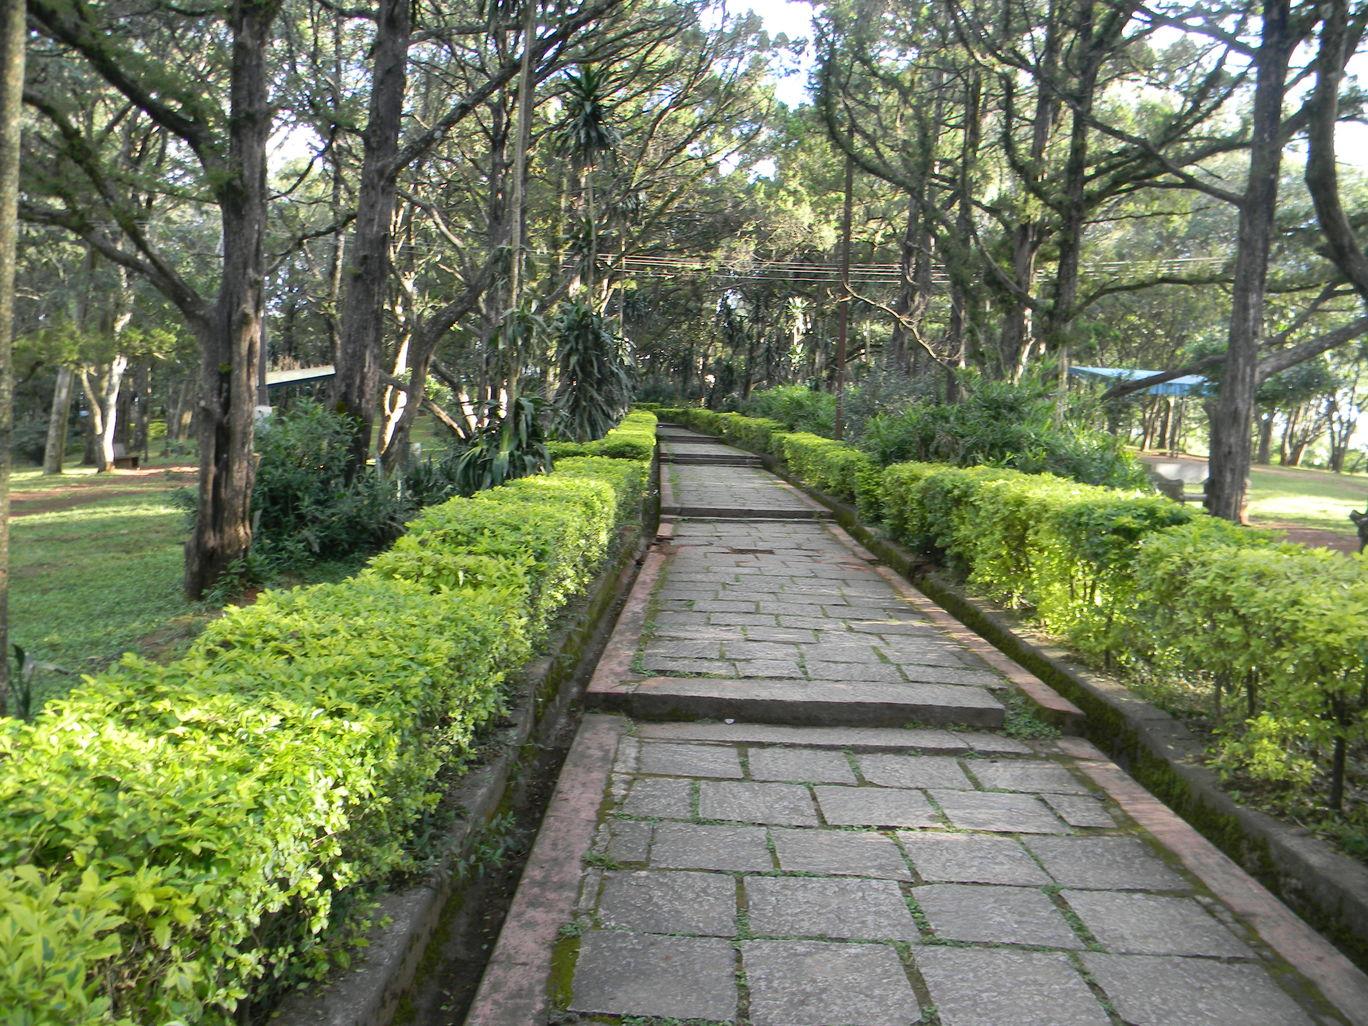 Photo of Nandi Hills By Chaitali Chatterjee